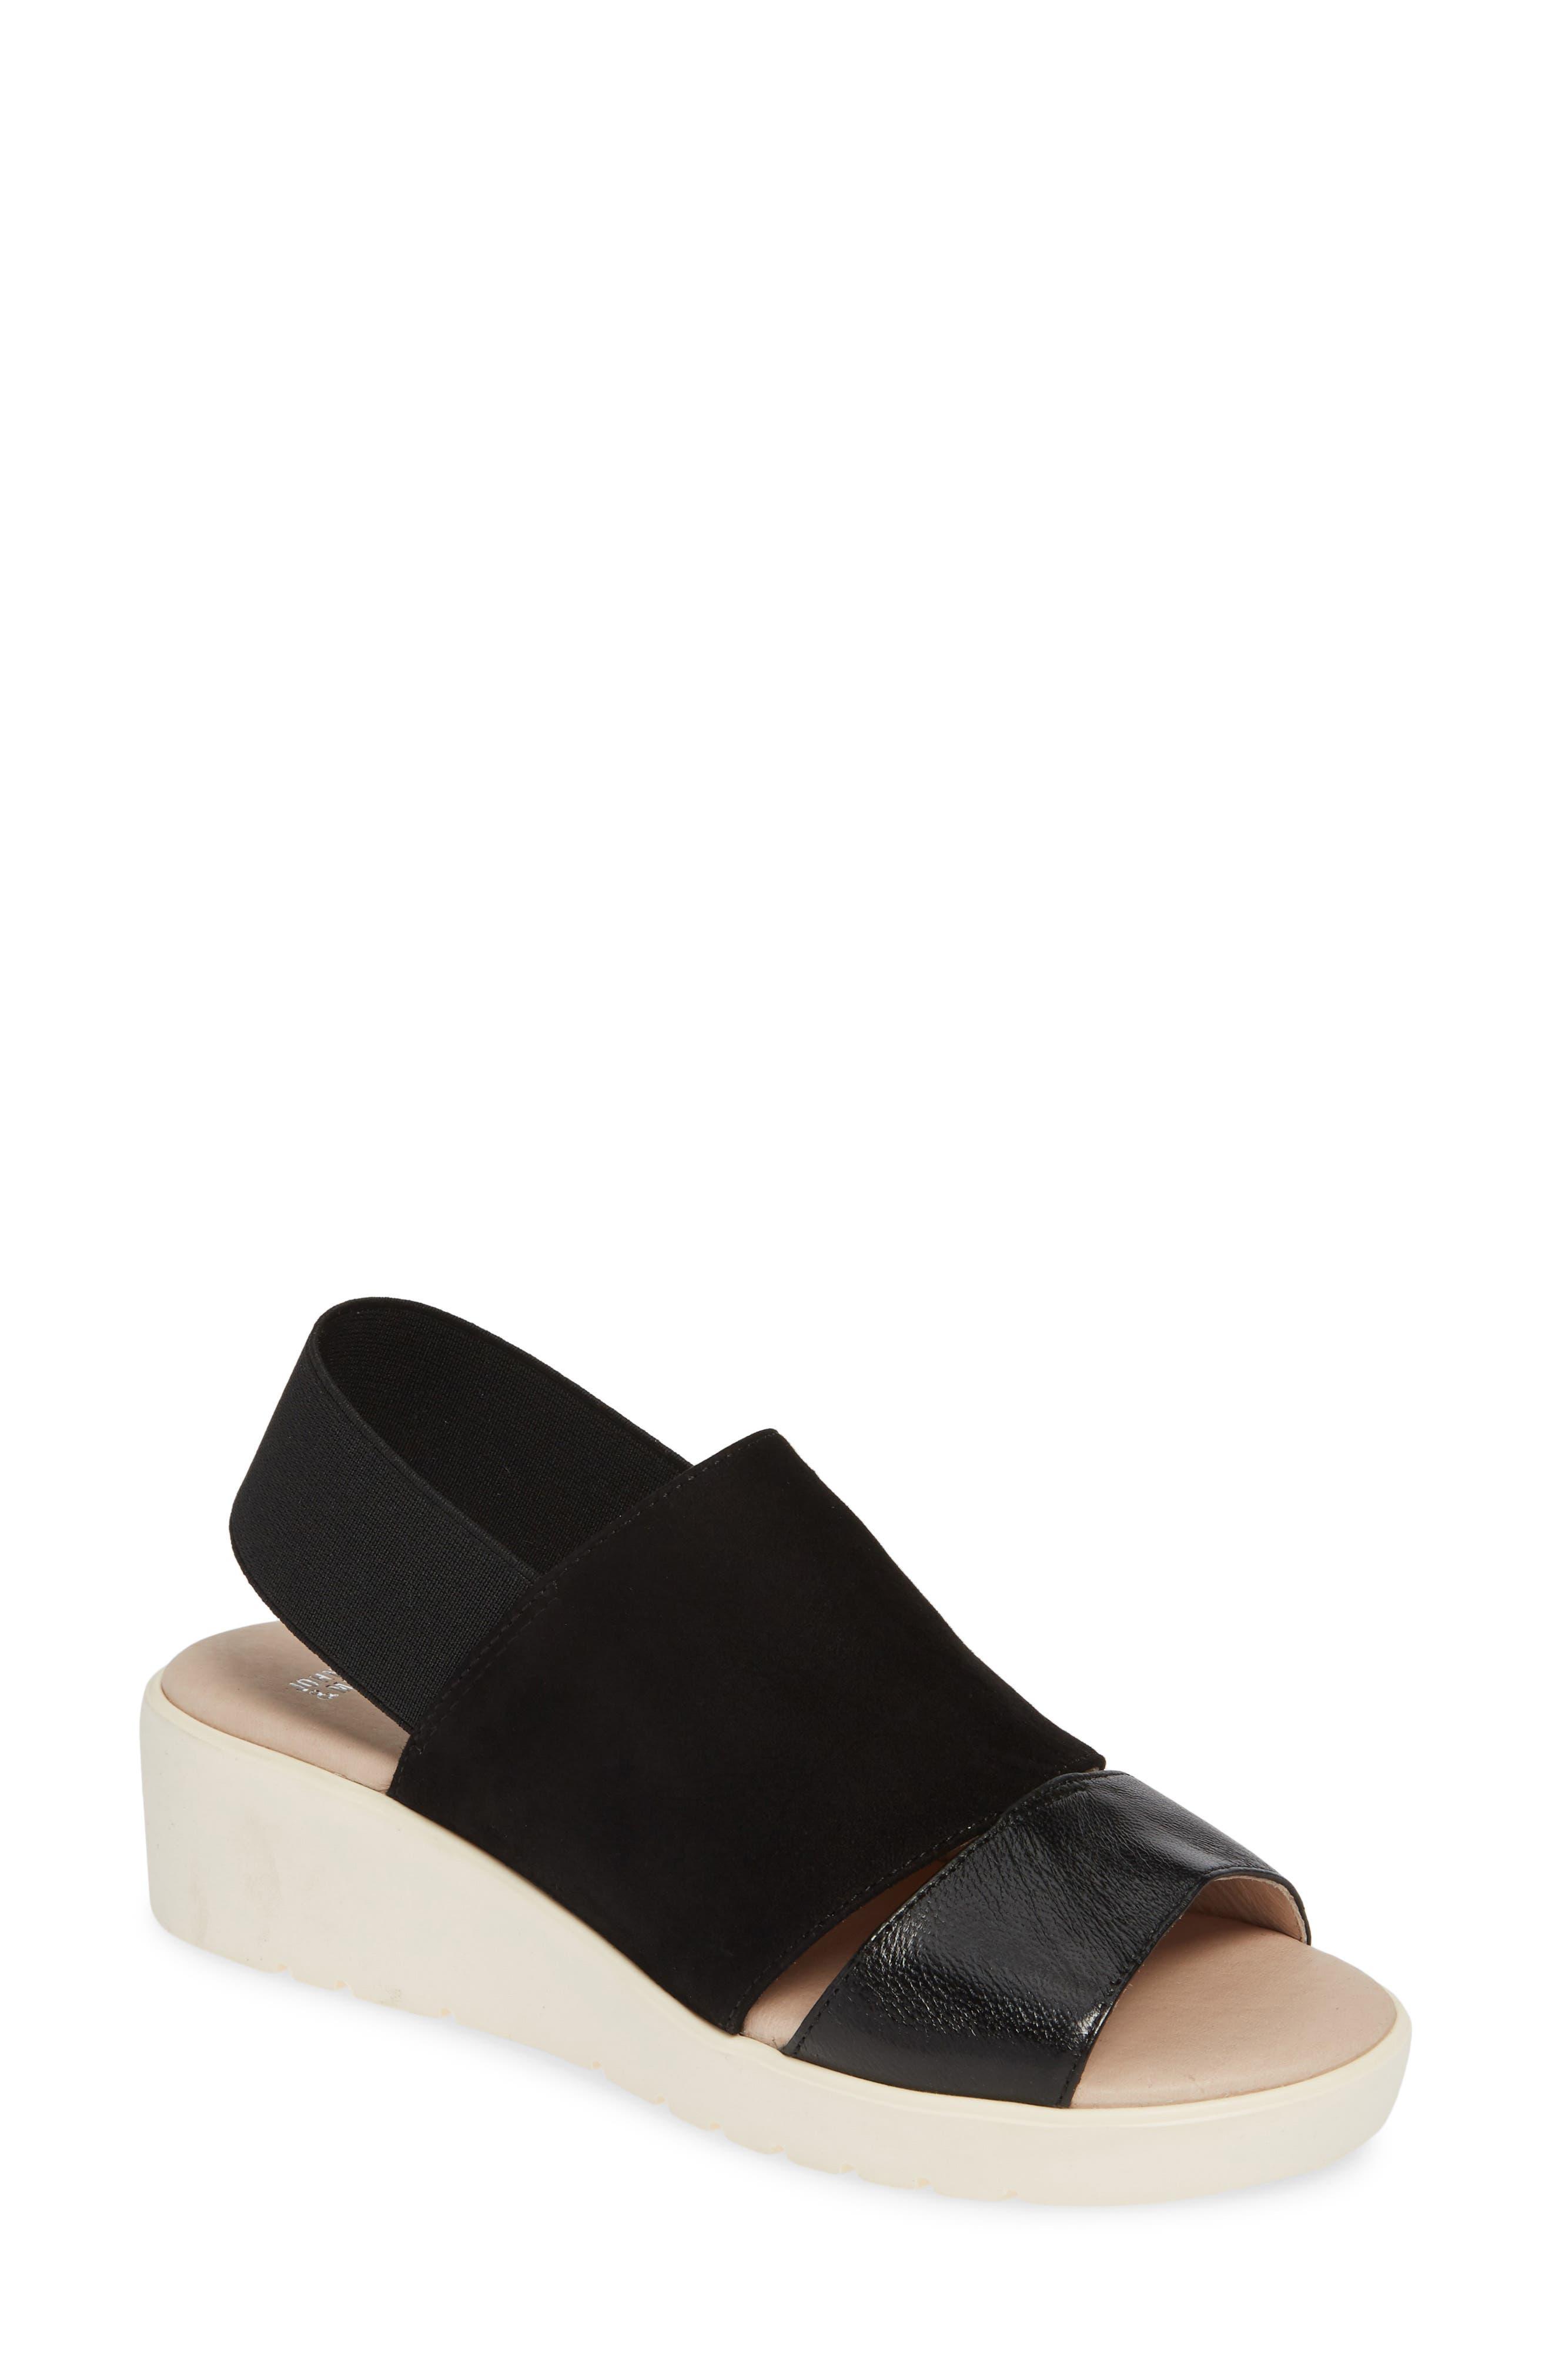 JOHNSTON & MURPHY Cassandra Slingback Platform Sandal, Main, color, BLACK LEATHER